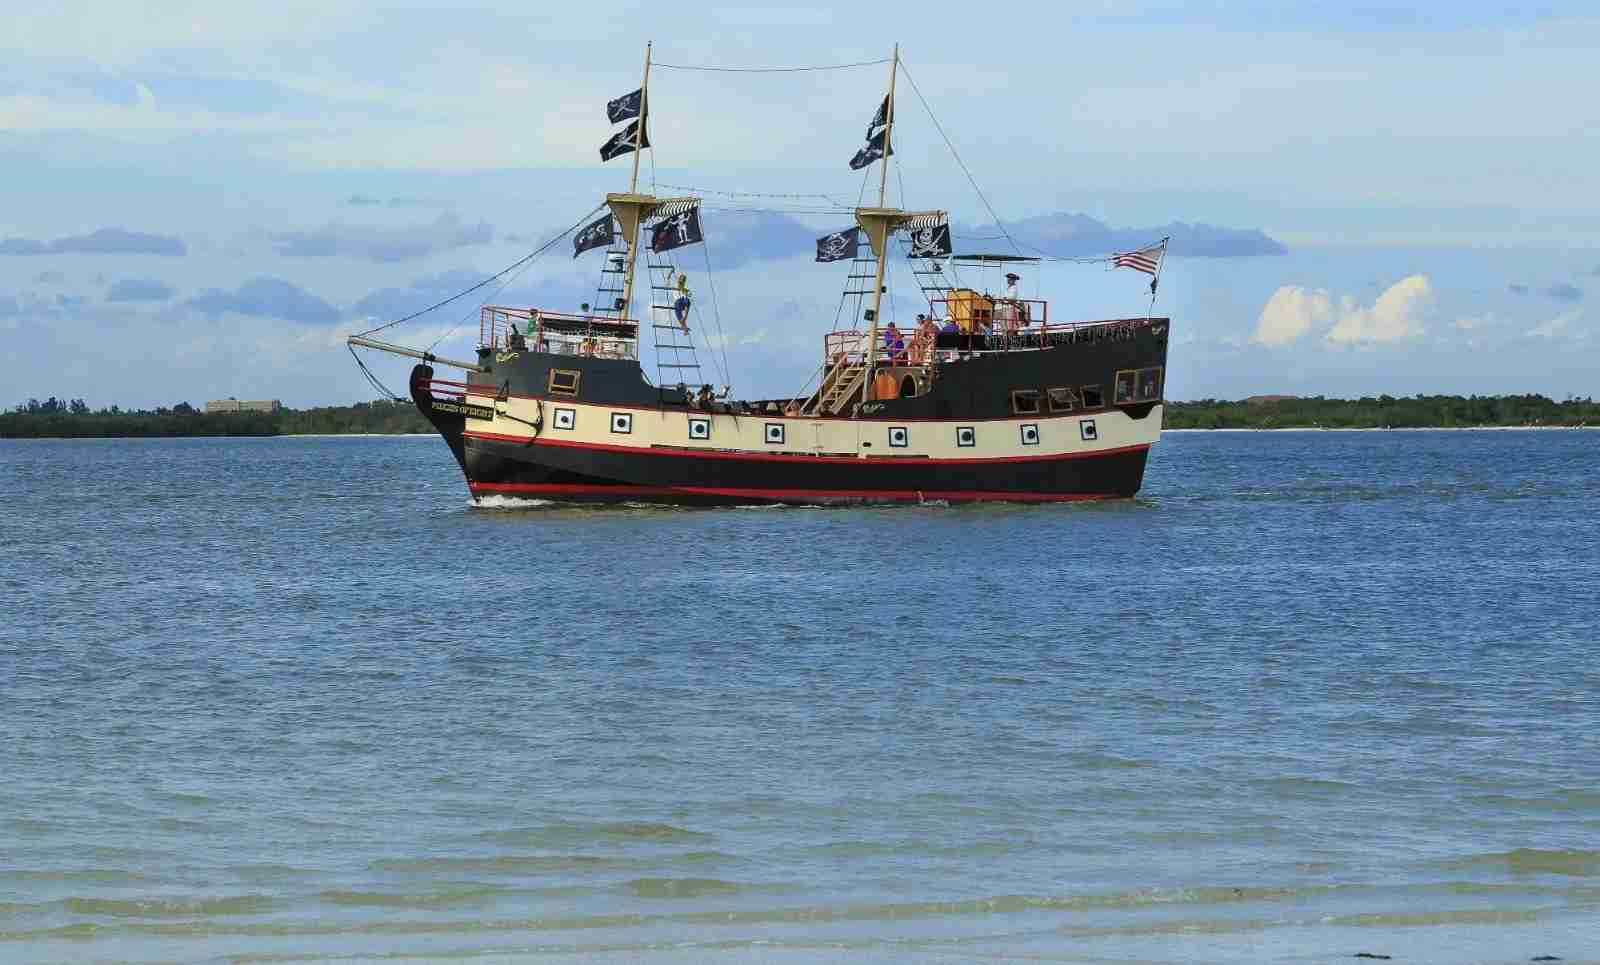 Salty Sam's Pirate Cruise. (Photo courtesy of Salty Sam's Pirate Cruise / Facebook)